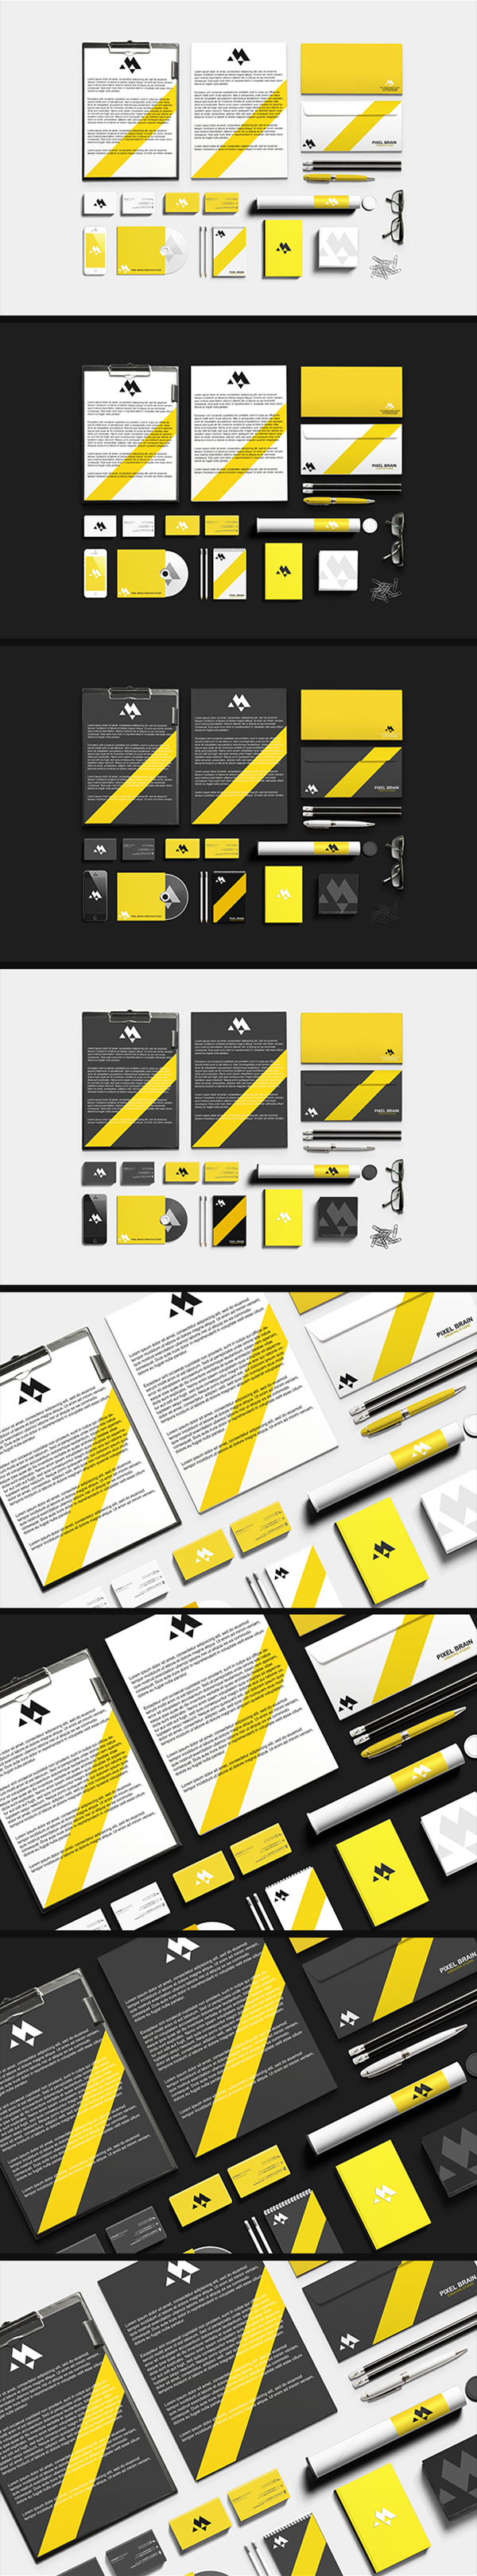 01 Stationary : Branding Mock-up Vol. 1